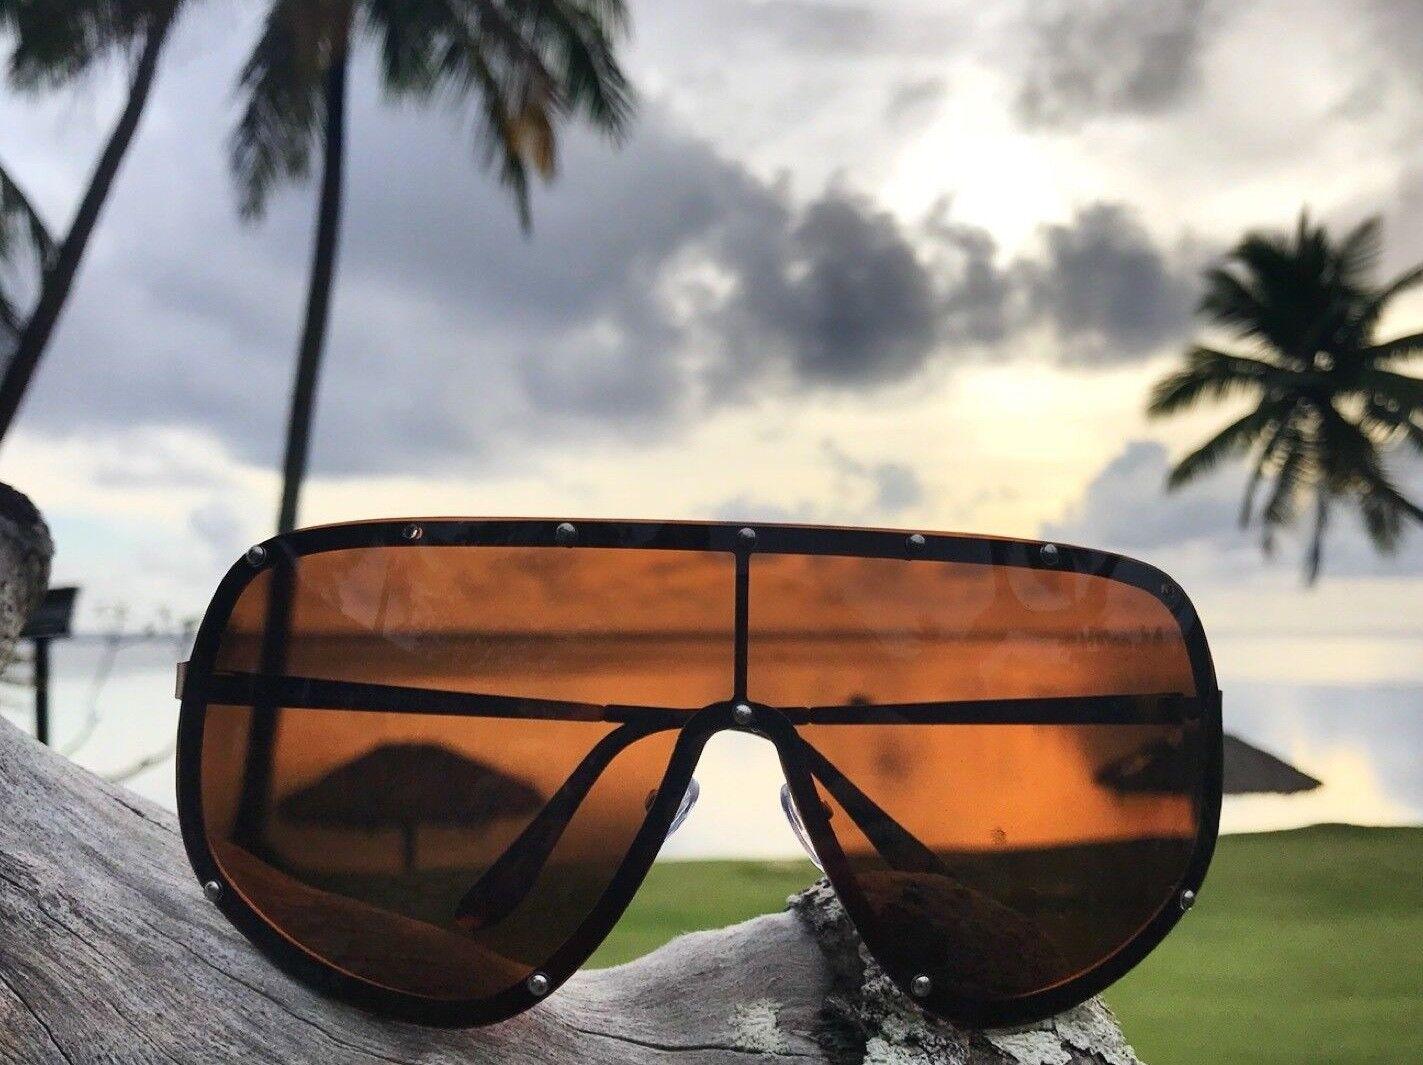 86fb9c6ed95 OVERSIZED Huge Big MASK SHIELD Half Face Owen Polarized Large MIRROR  Sunglasses